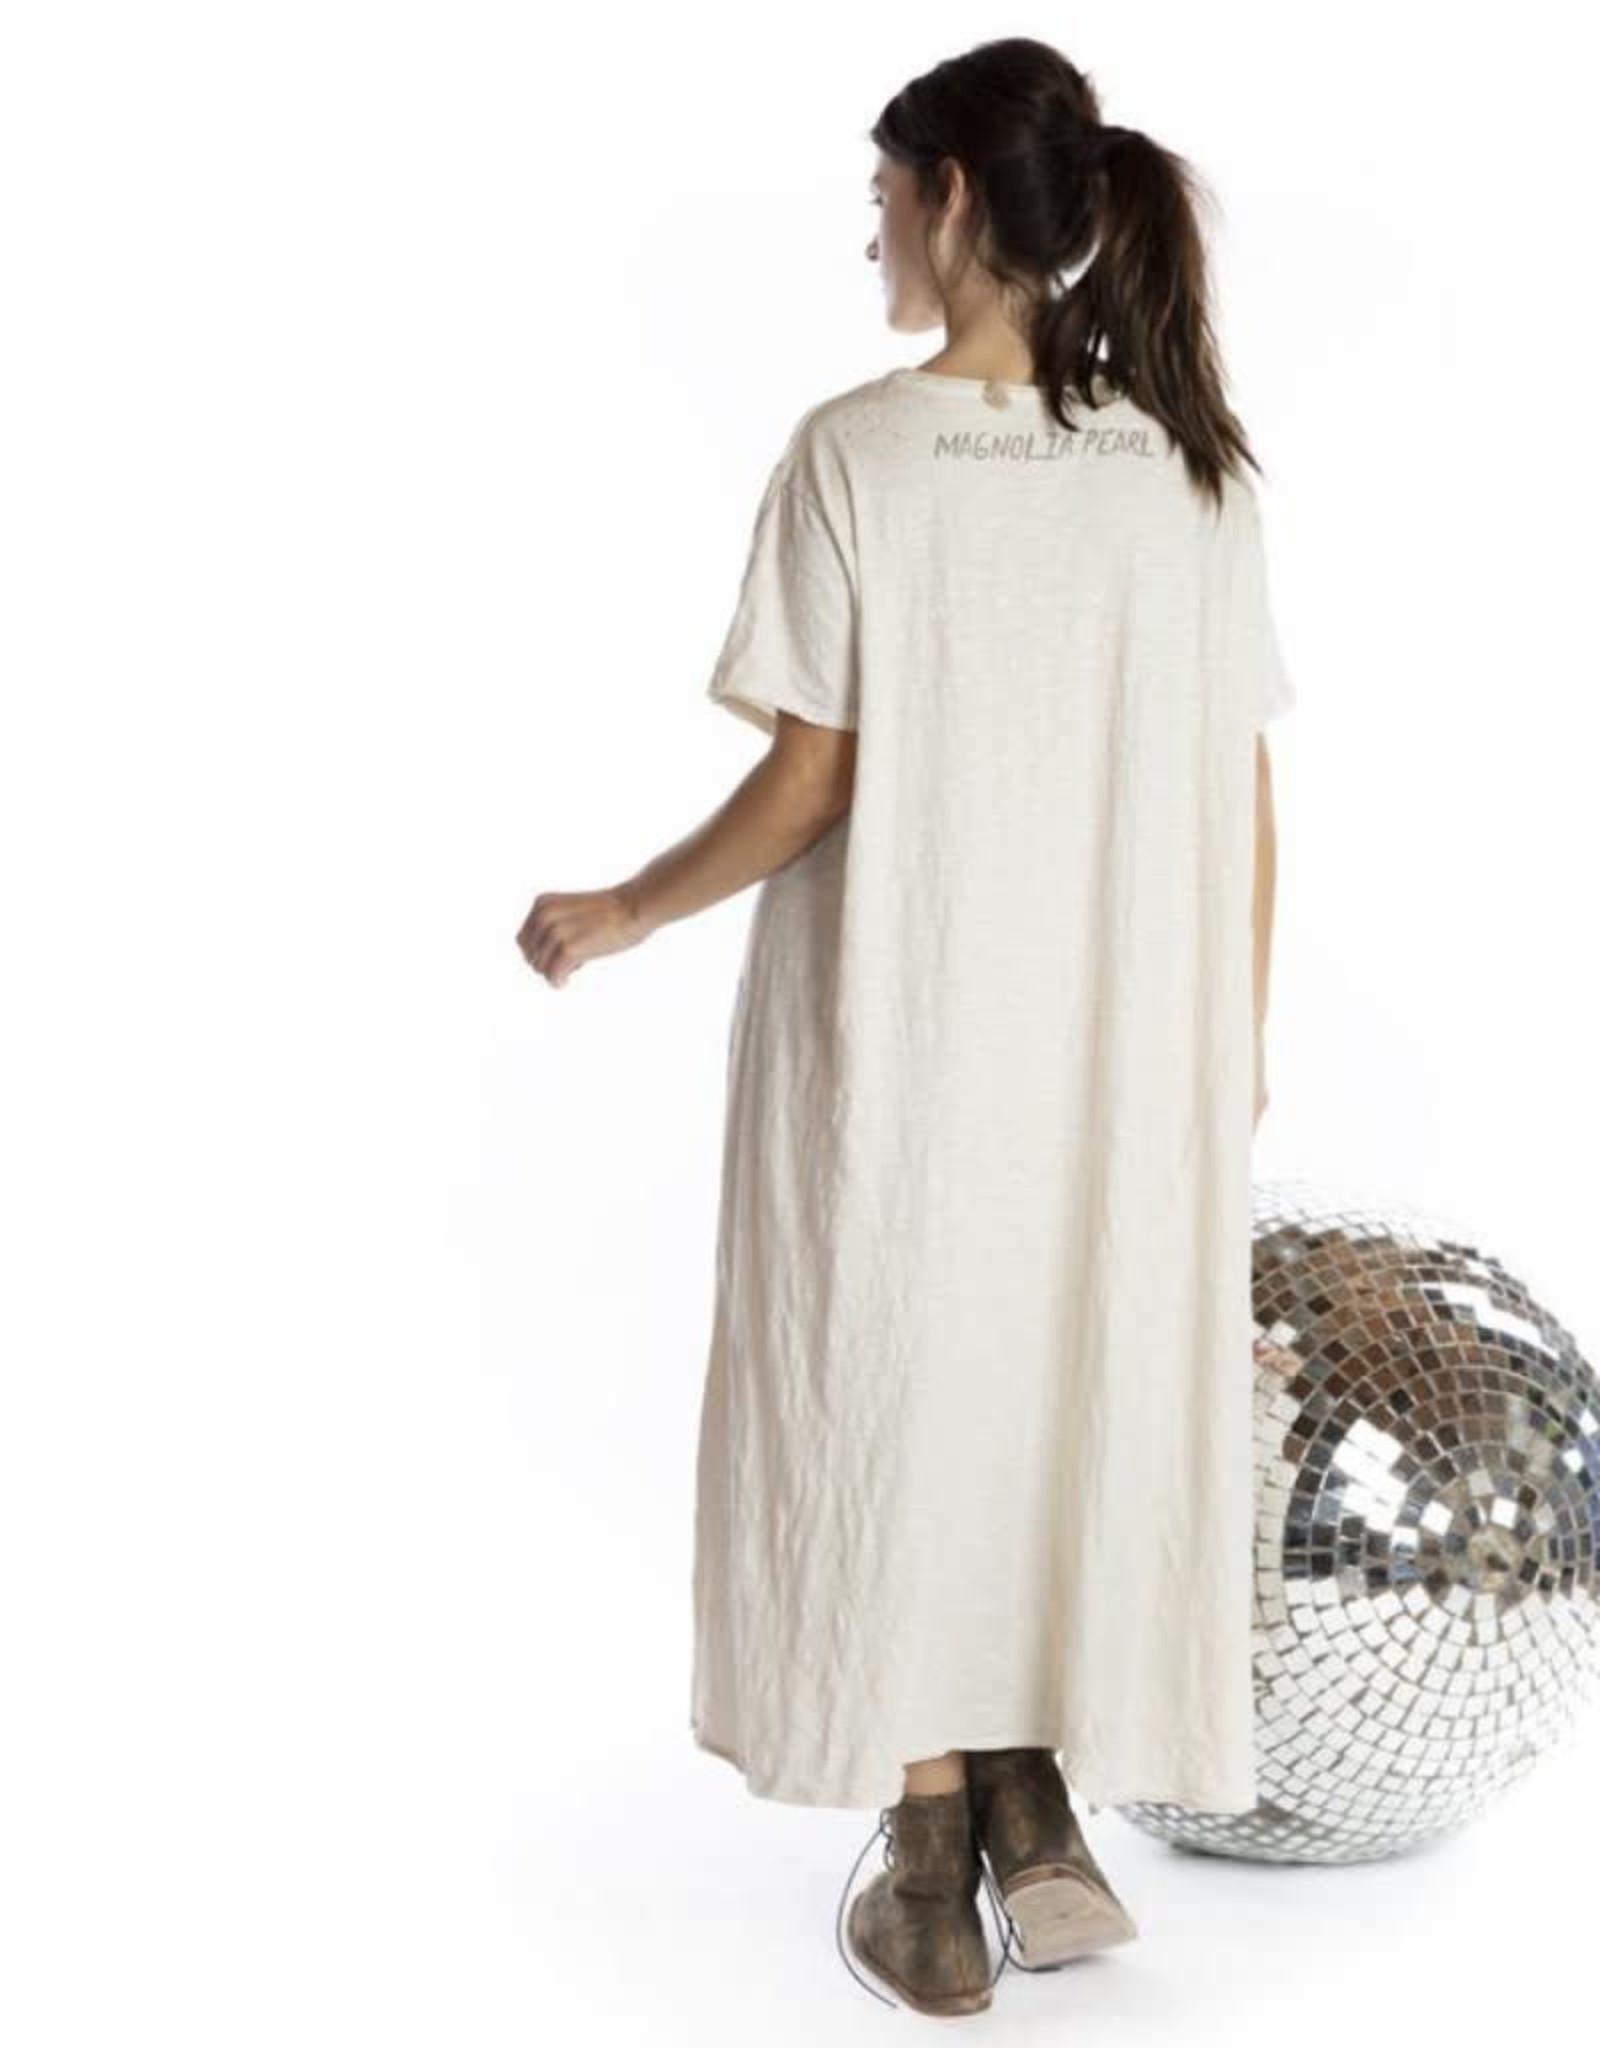 Magnolia Pearl Dress 713 (Moonlight, O/S)